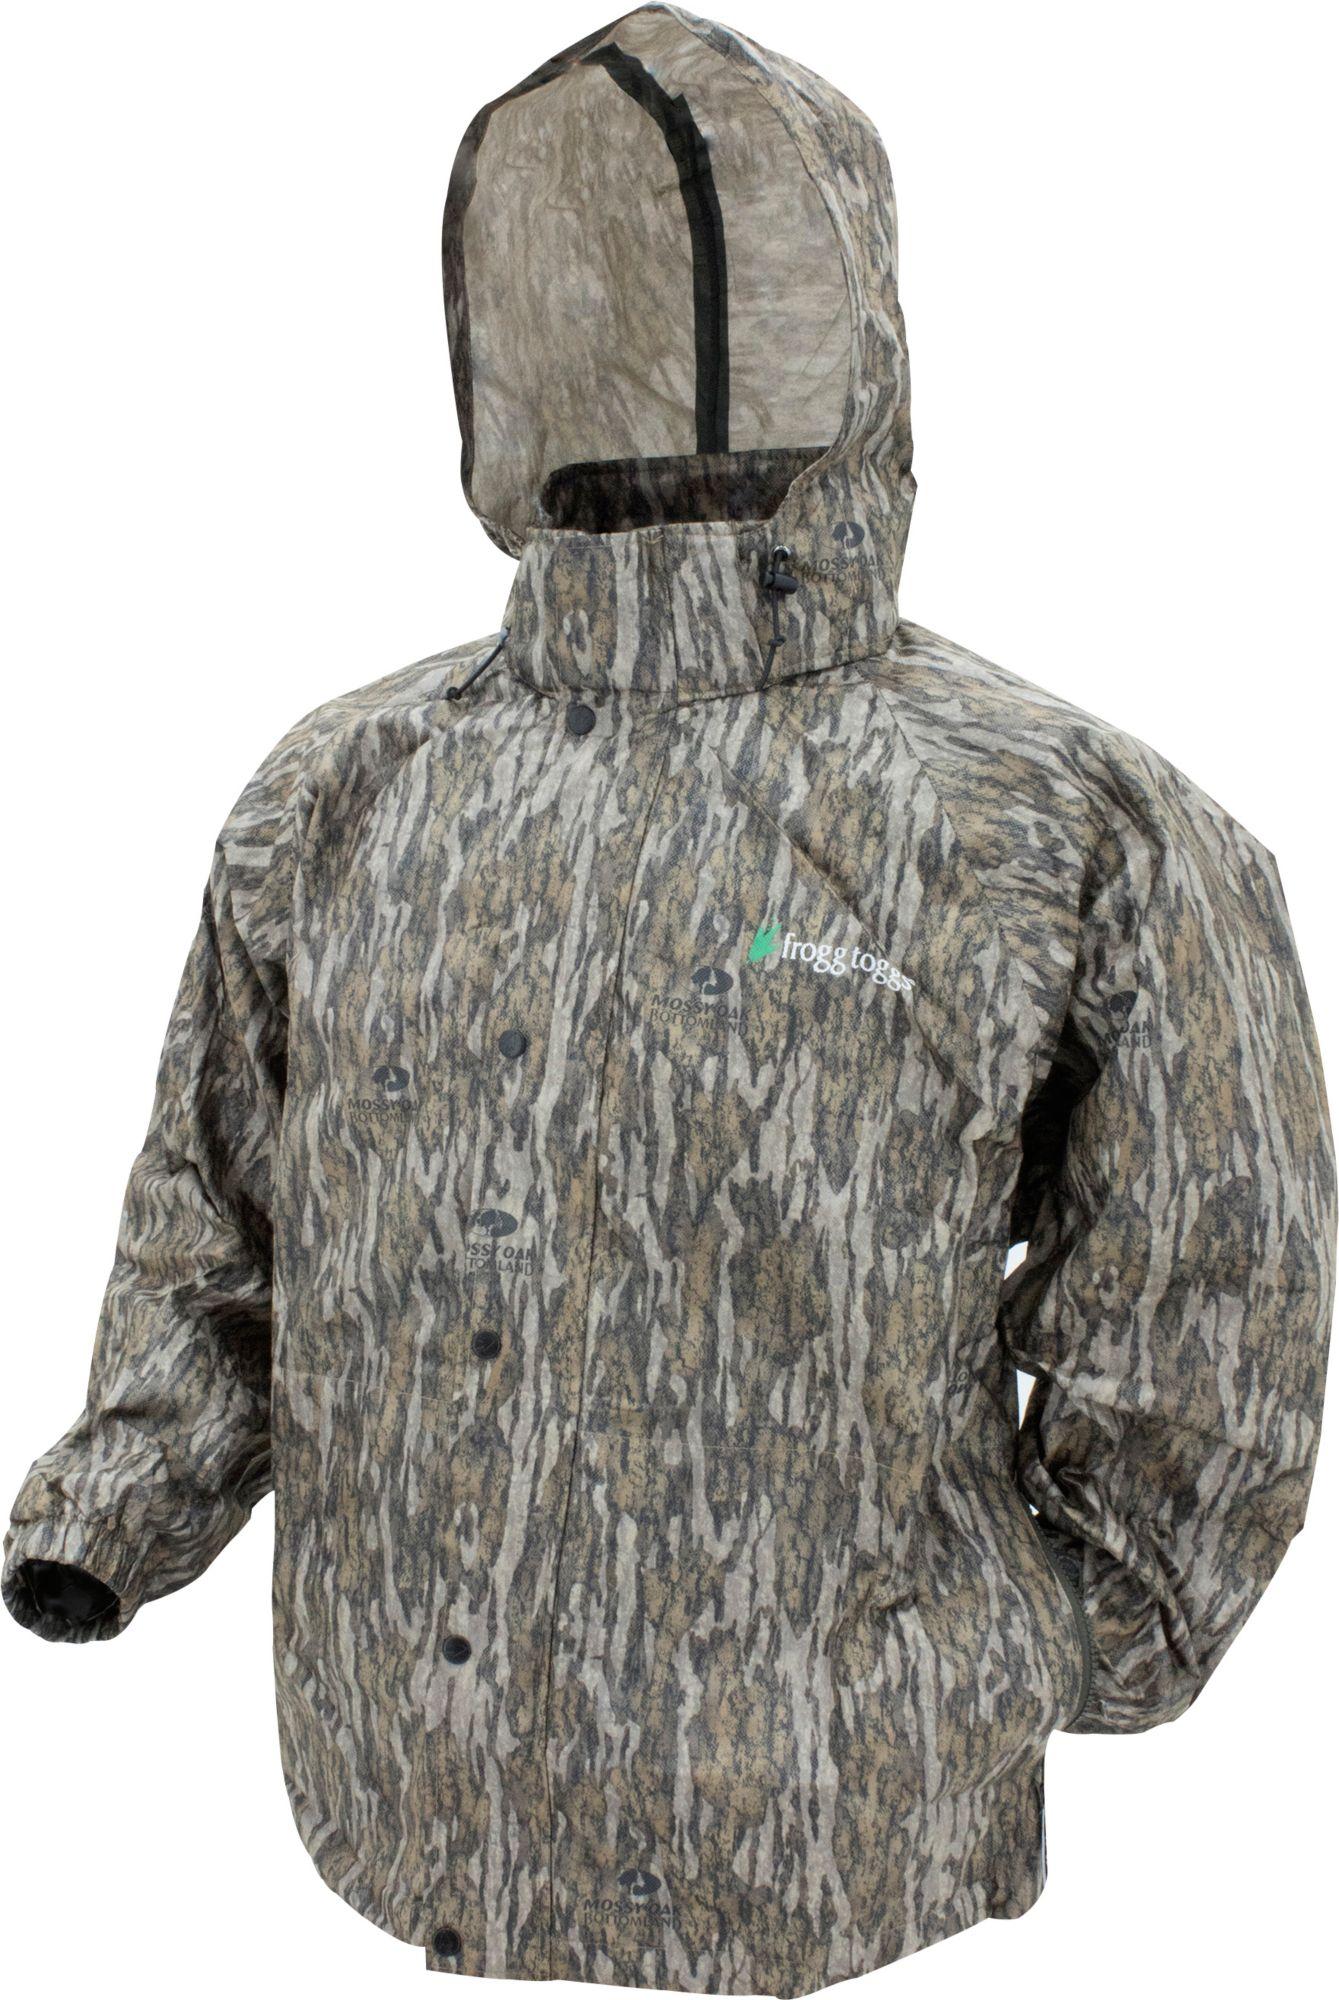 frogg toggs Men's Classic Pro Action Rain Jacket, Size: 3XL, Mossy Oak Bottomland thumbnail